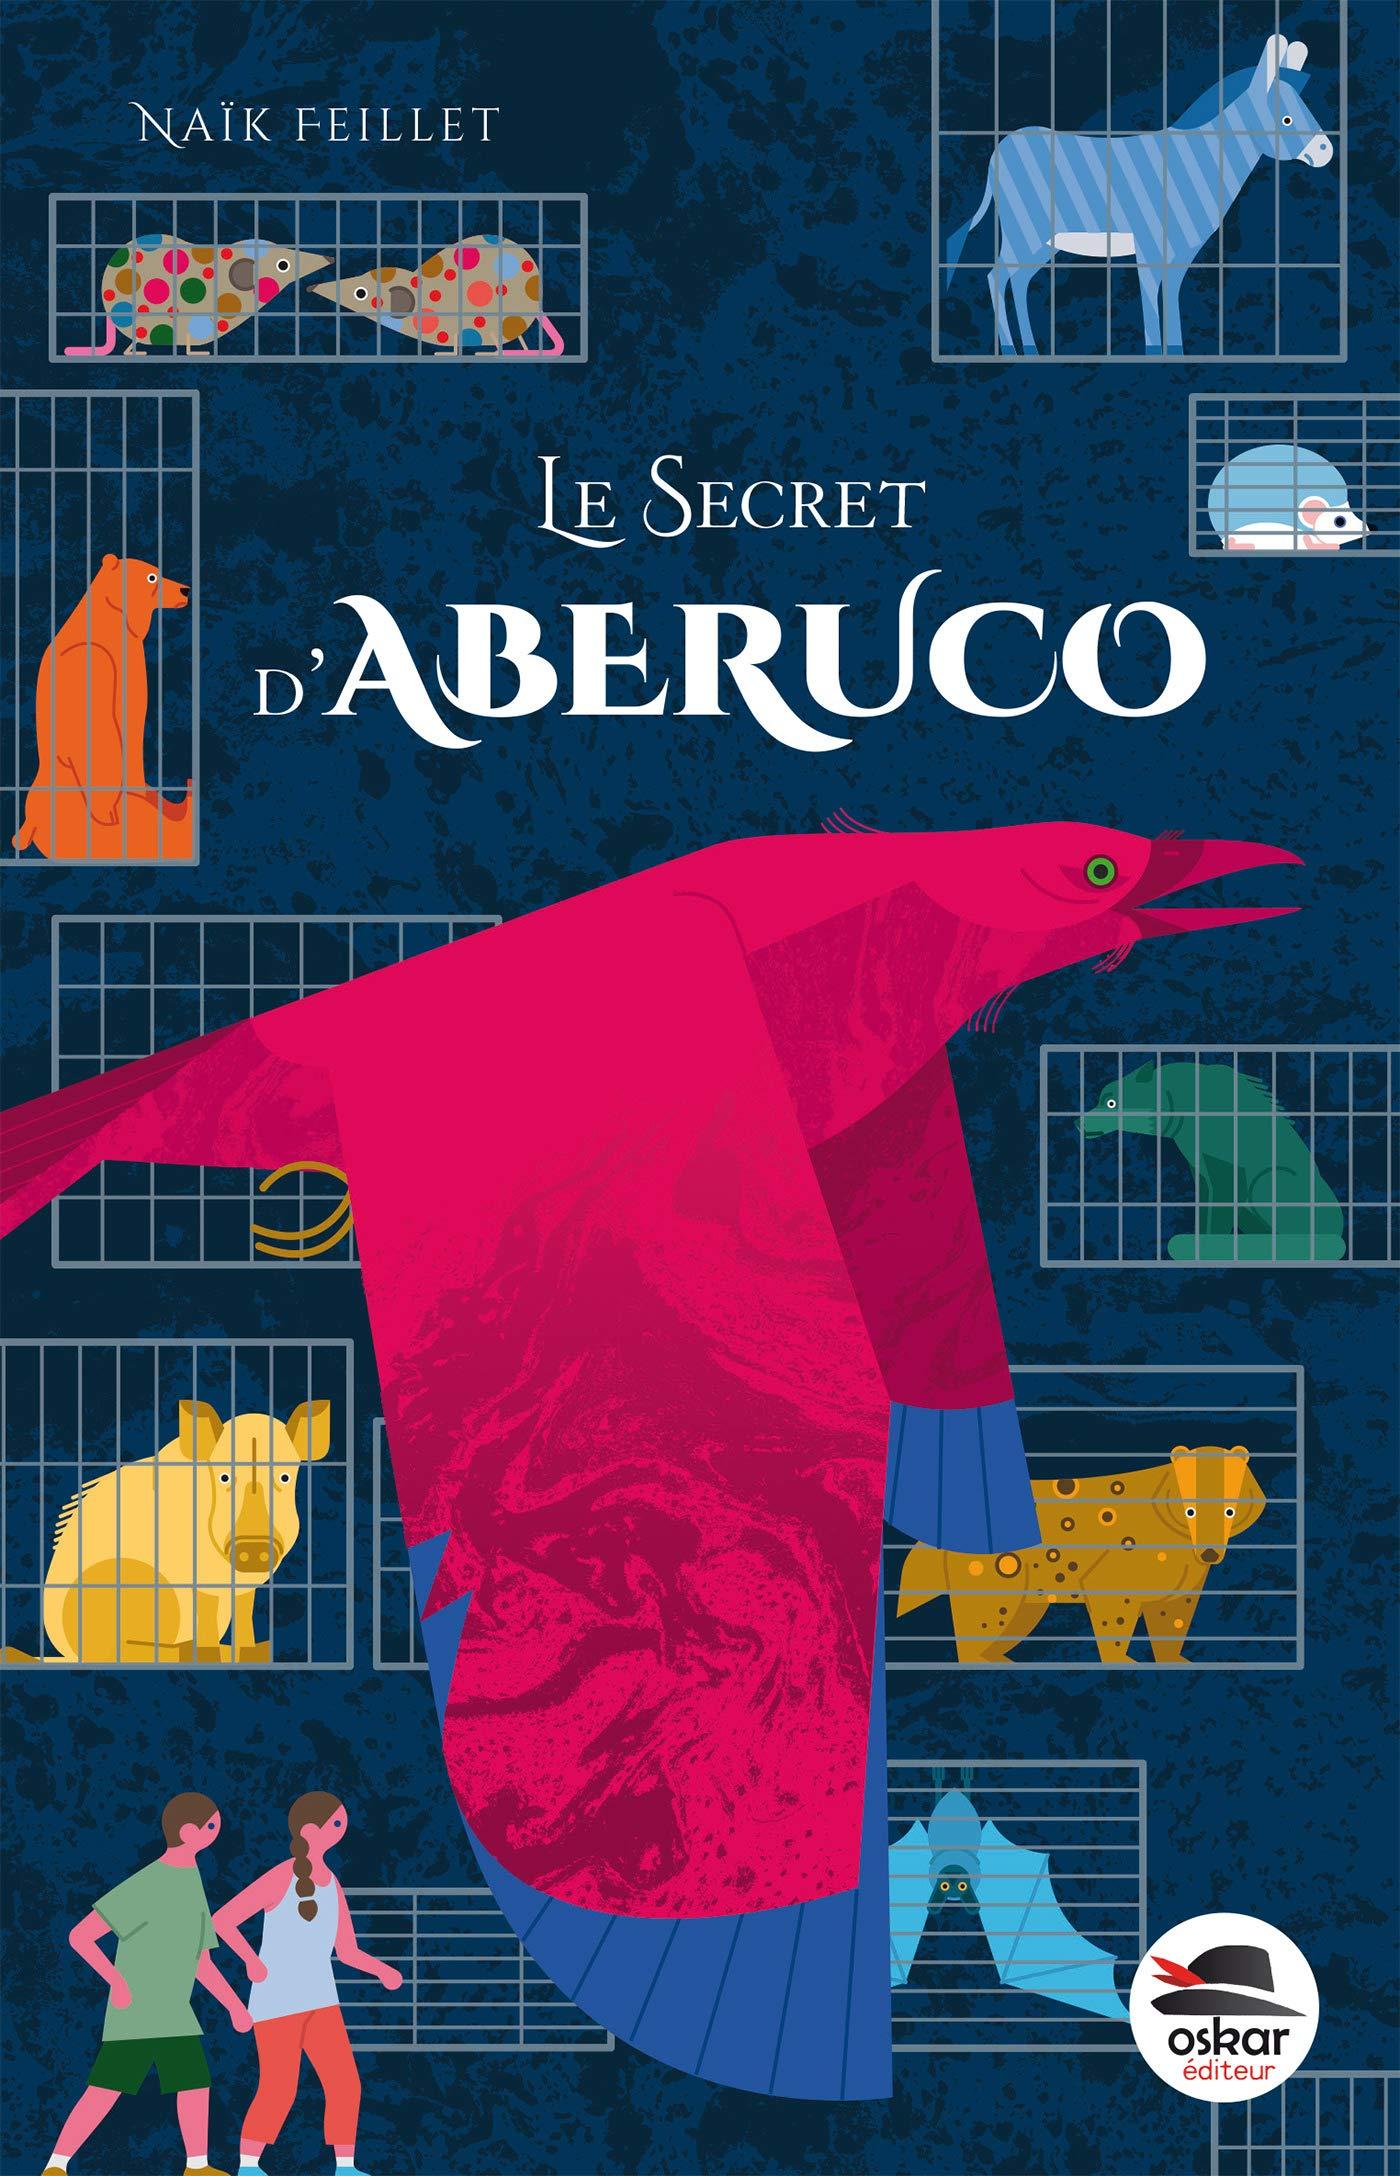 Le secret d'Aberuco Naïk Feillet